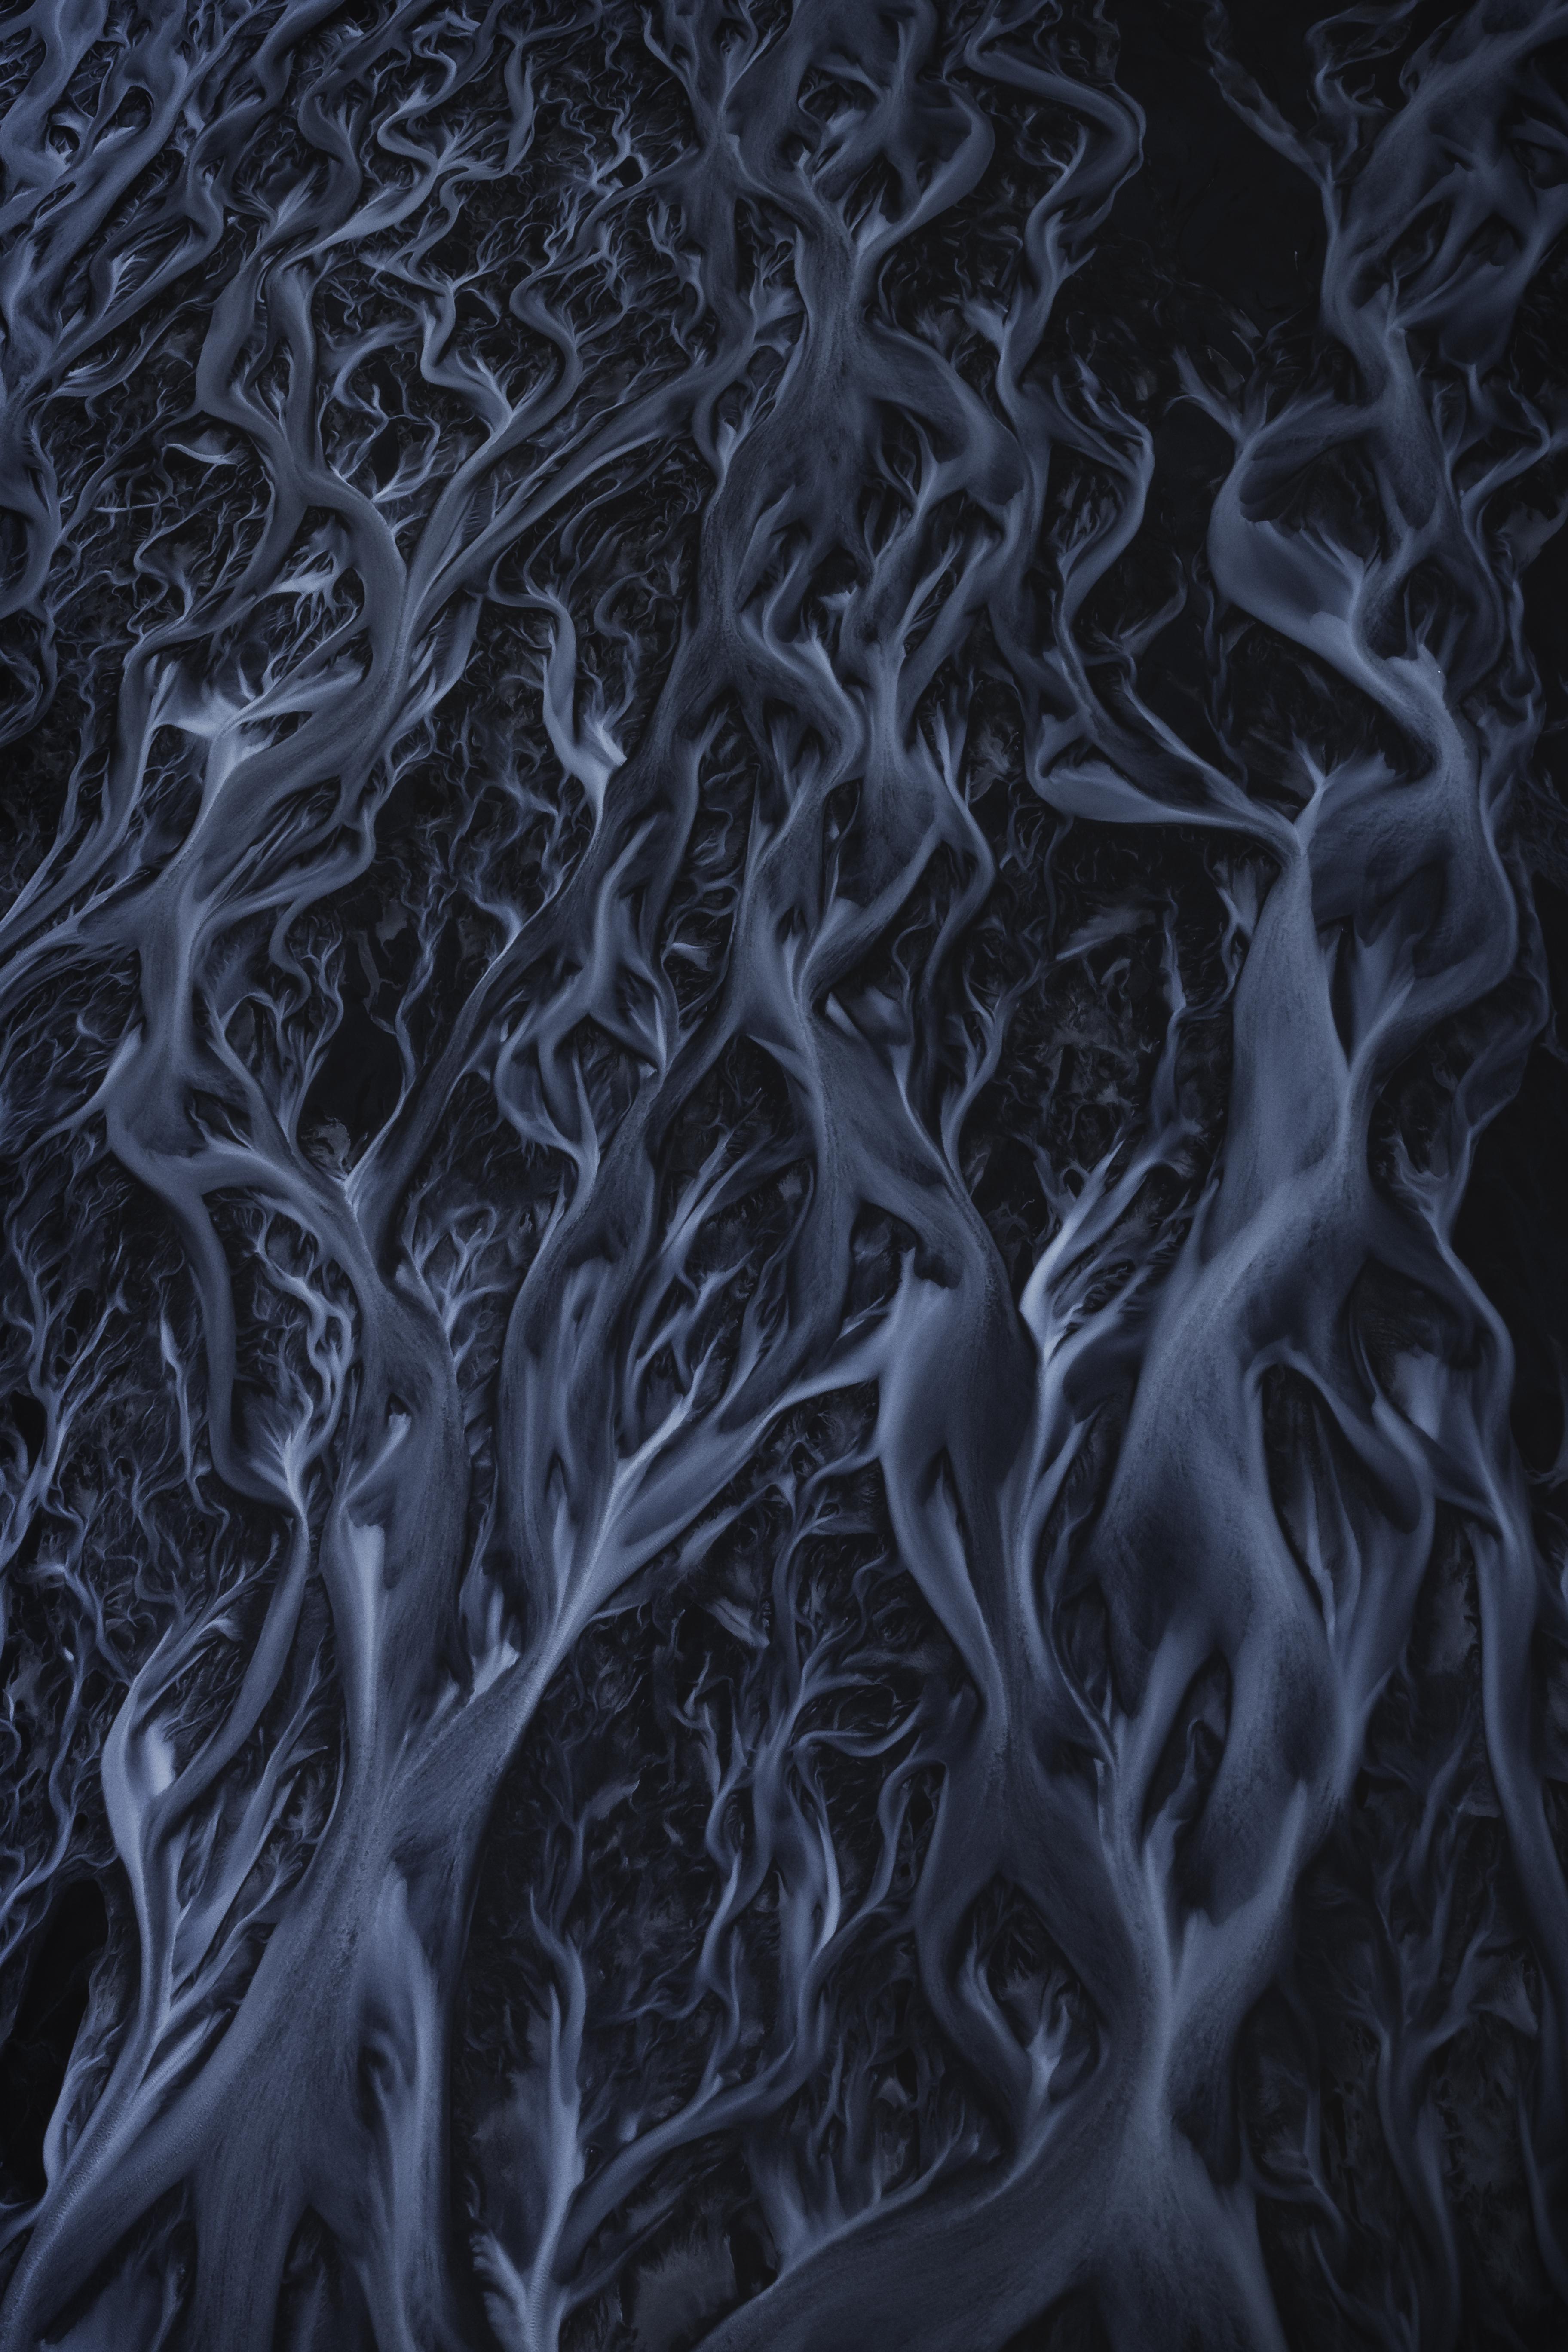 General 3648x5472 stream Glacial Lake Iceland ice nature aerial view portrait display dark black